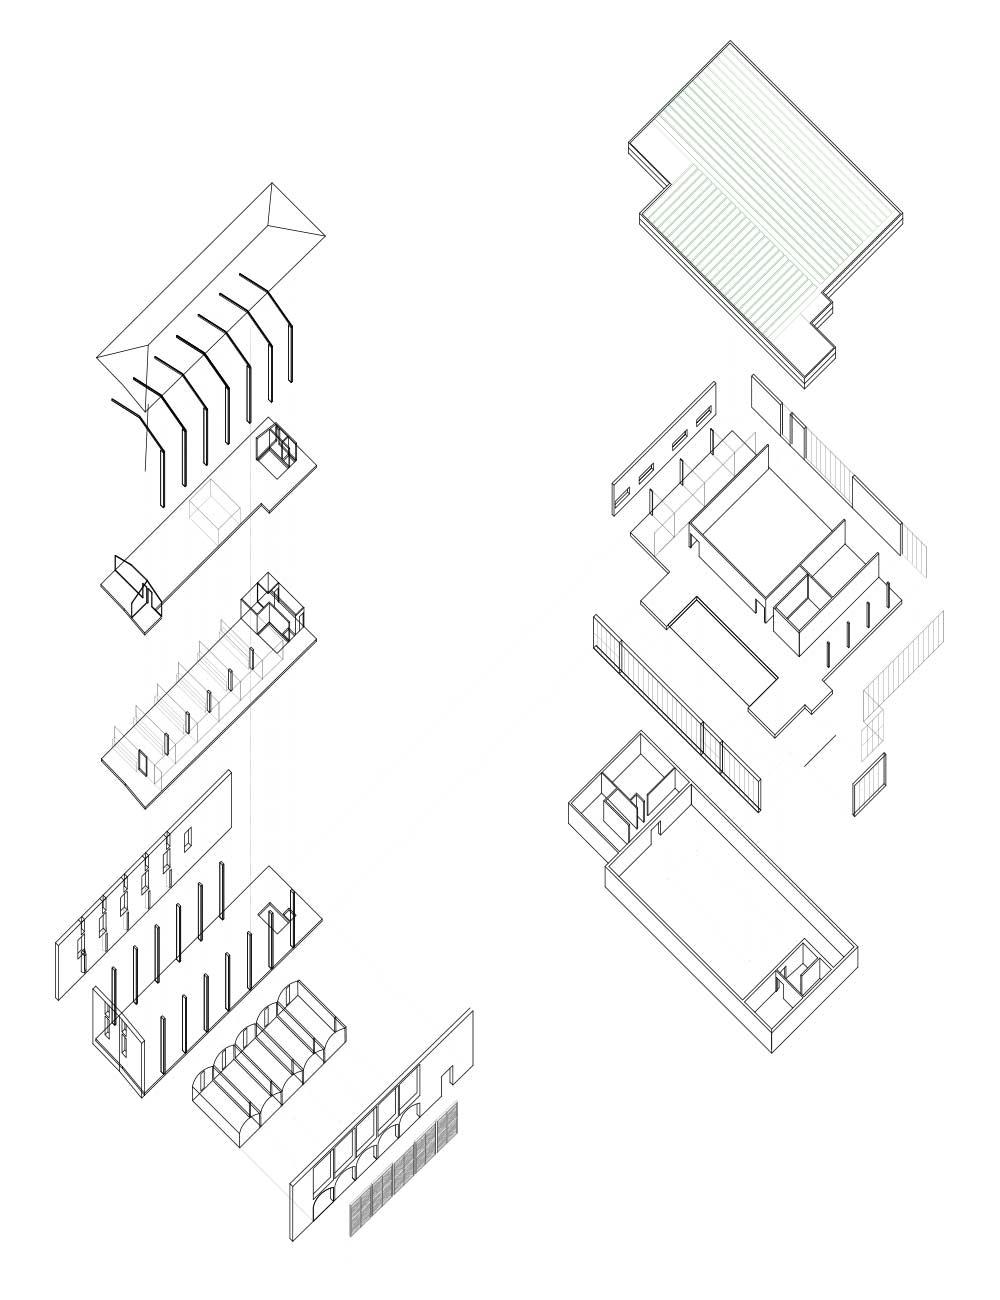 martinoli pasini architetti associati